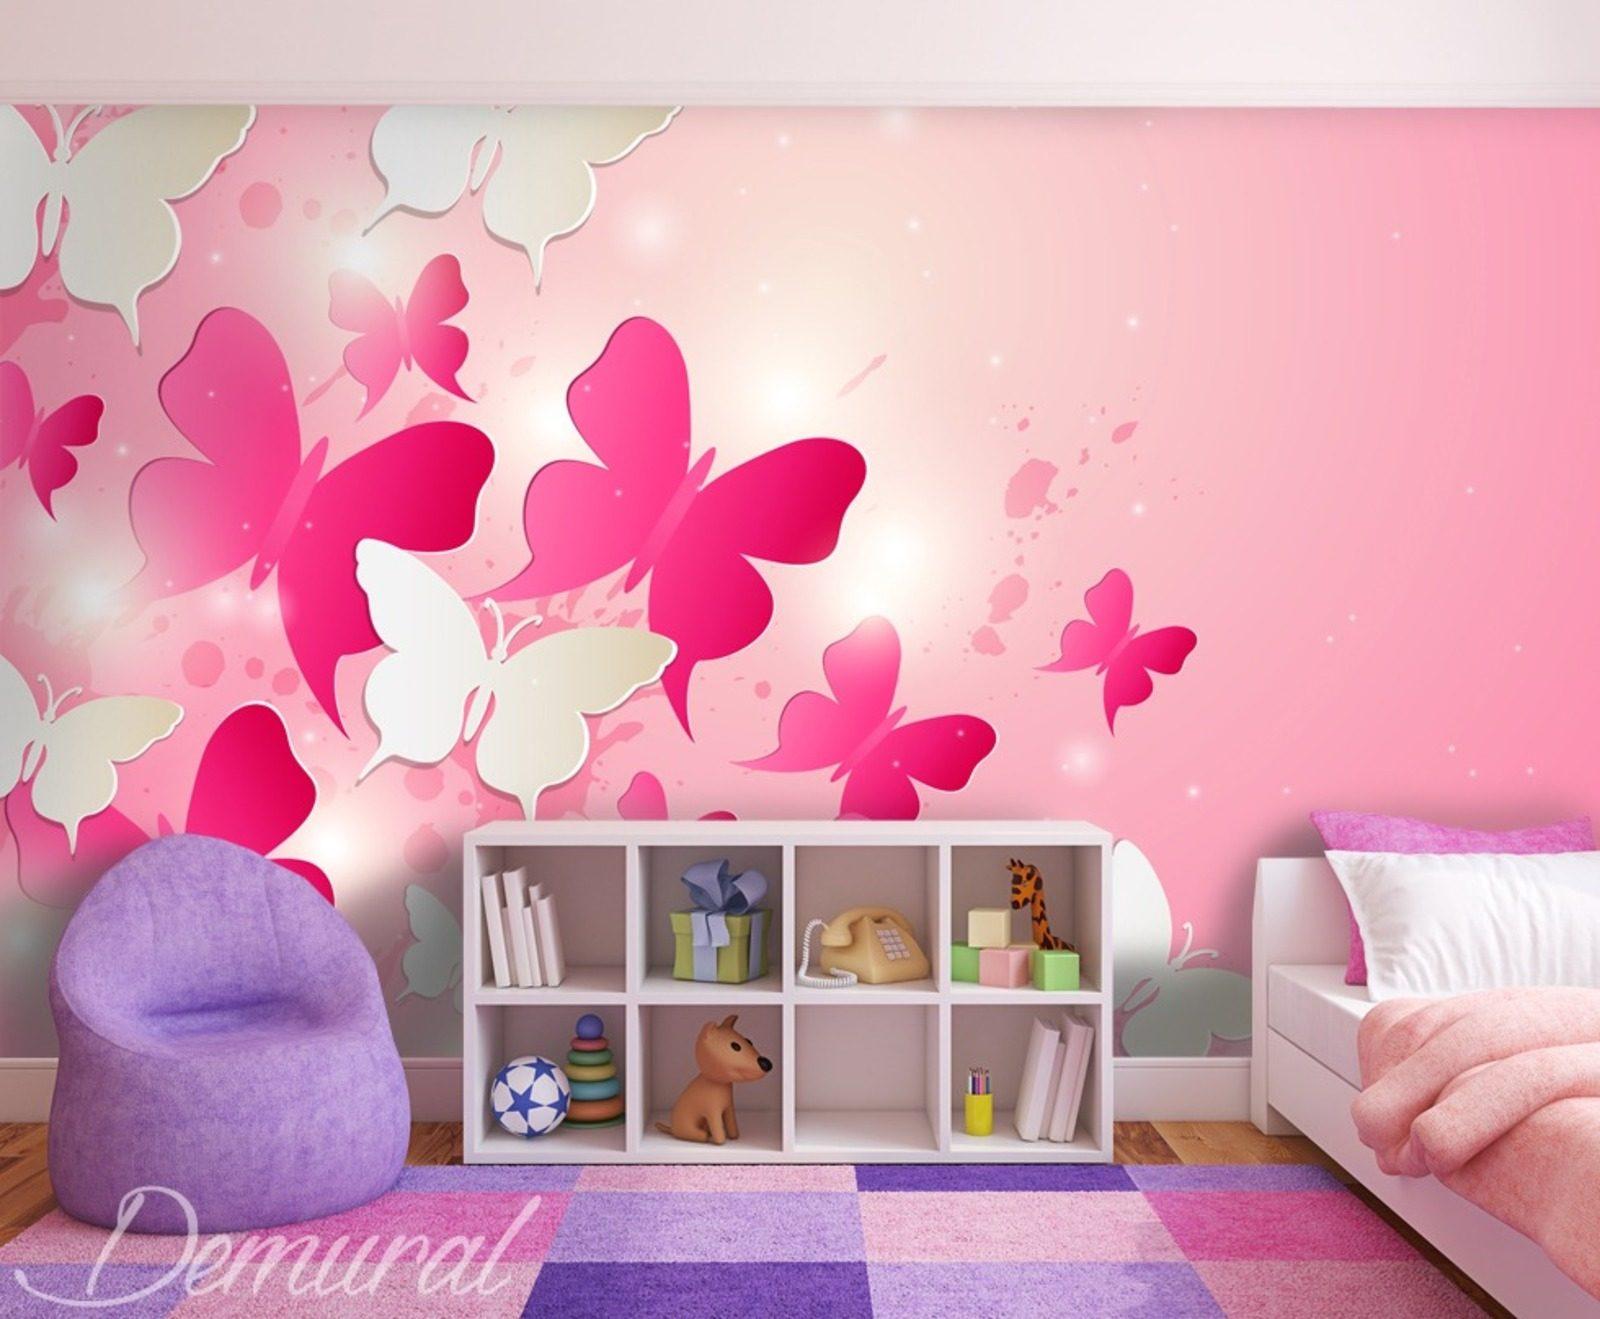 in dem rosaroten k nigsreich fototapete f r kinderzimmer fototapeten demural. Black Bedroom Furniture Sets. Home Design Ideas